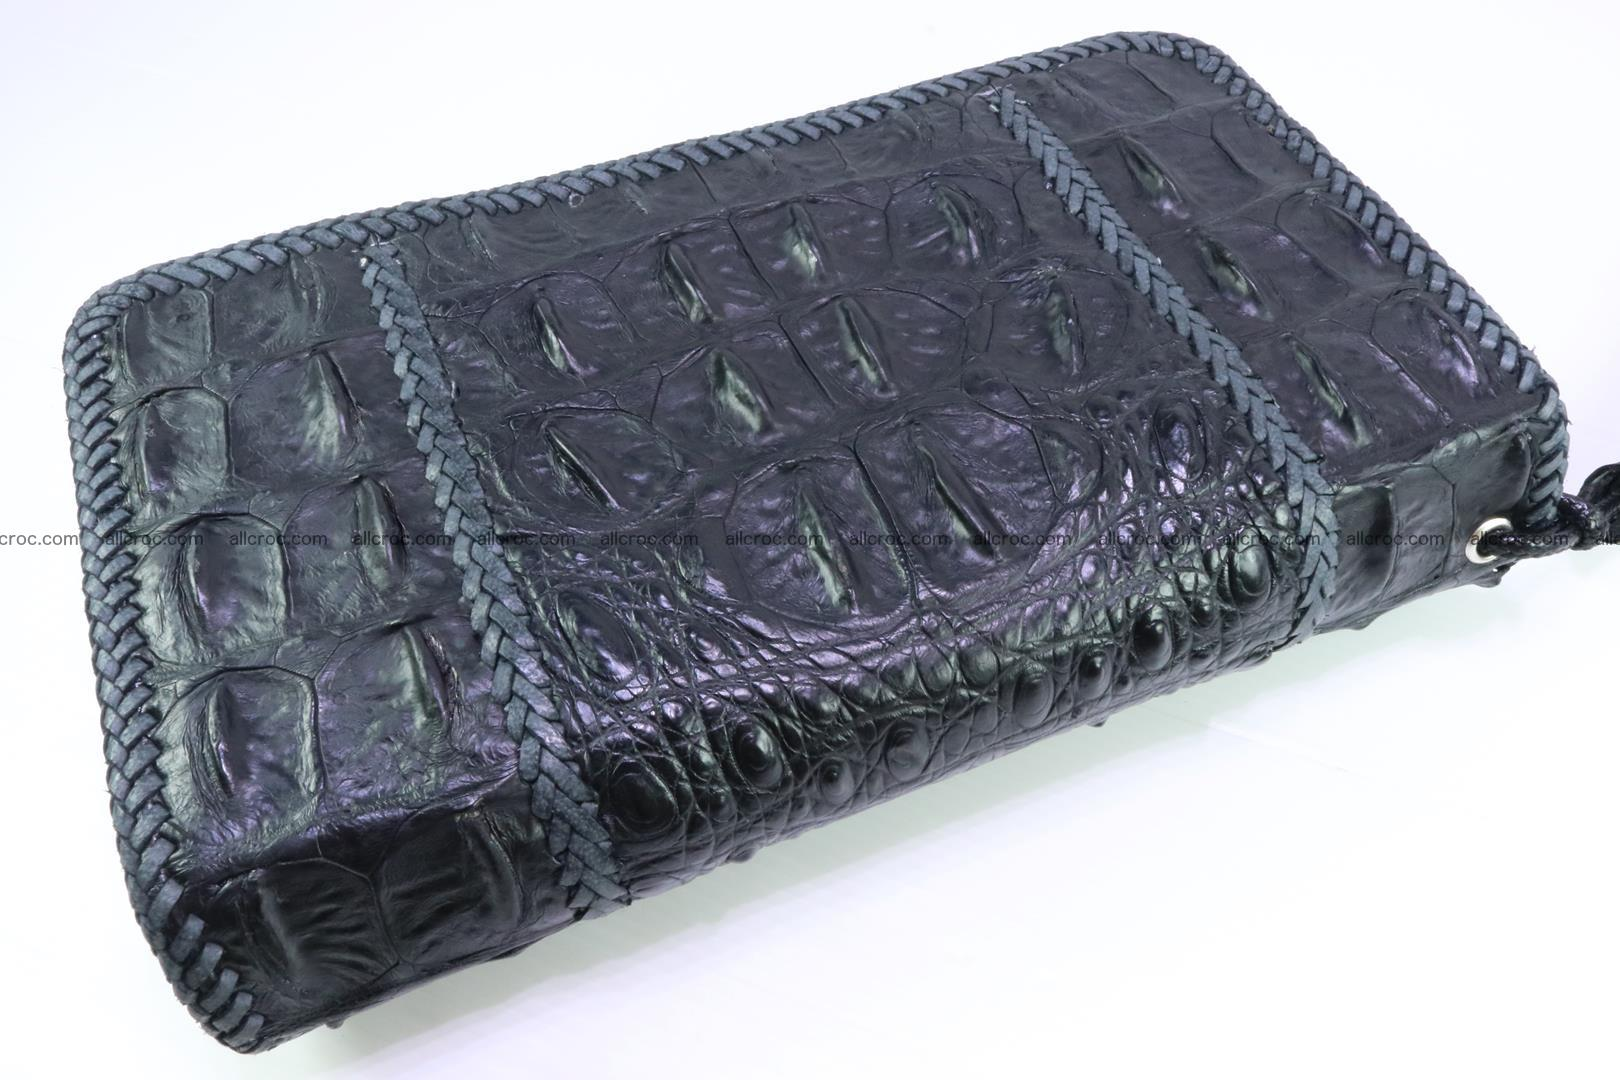 Crocodile clutch for men from genuine hornback crocodile leather 160 Foto 1